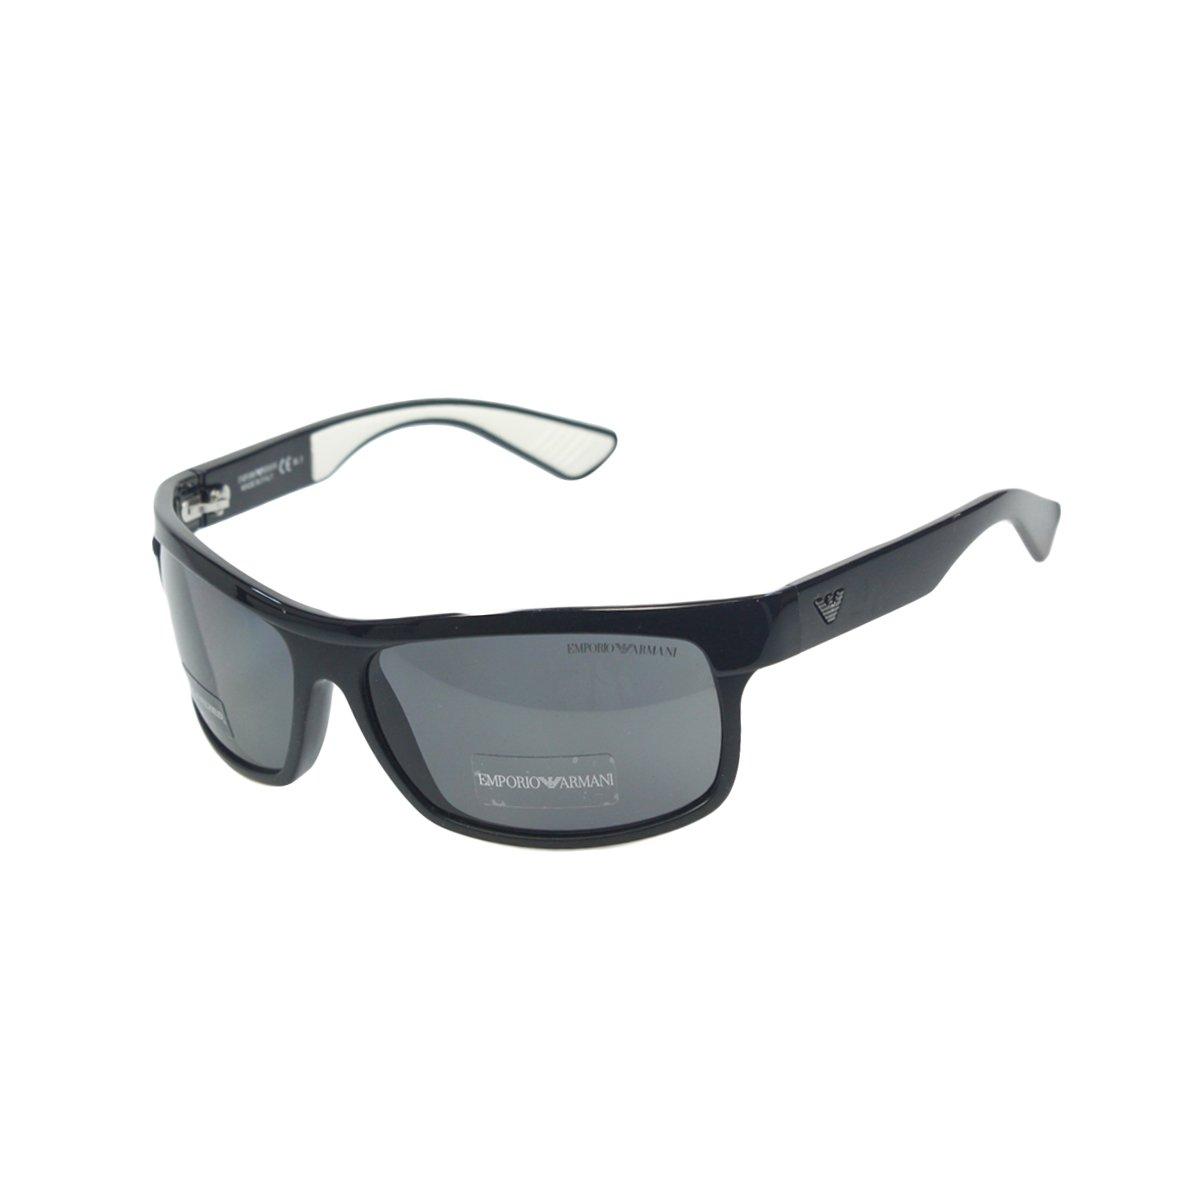 b10fd231b7b5 Emporio Armani Men s 9780 Shiny Black Frame Grey Polarized Lens Plastic  Sunglasses  Amazon.co.uk  Clothing